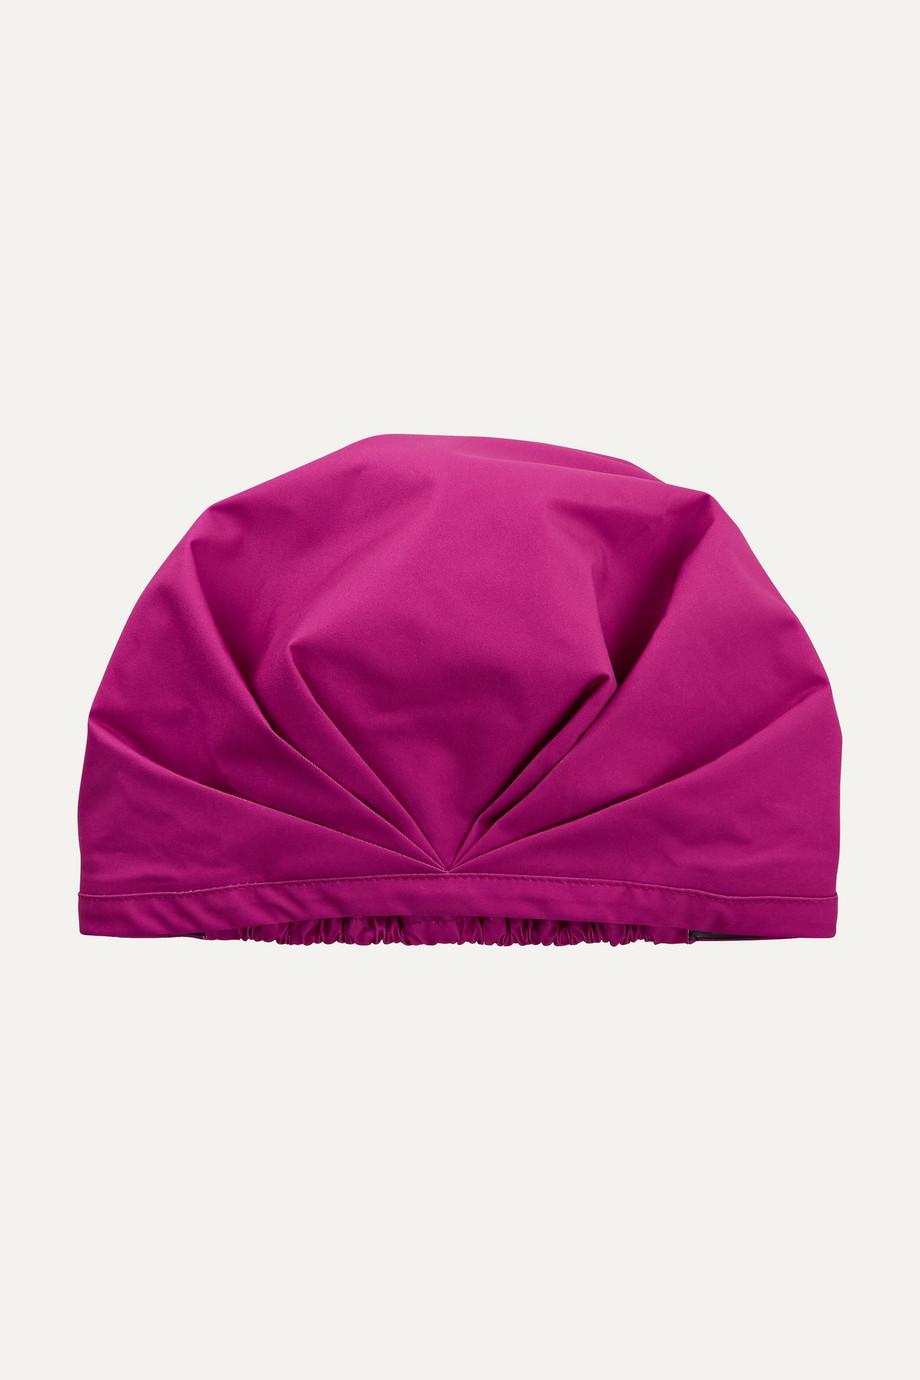 SHHHOWERCAP The Not Basic shower cap